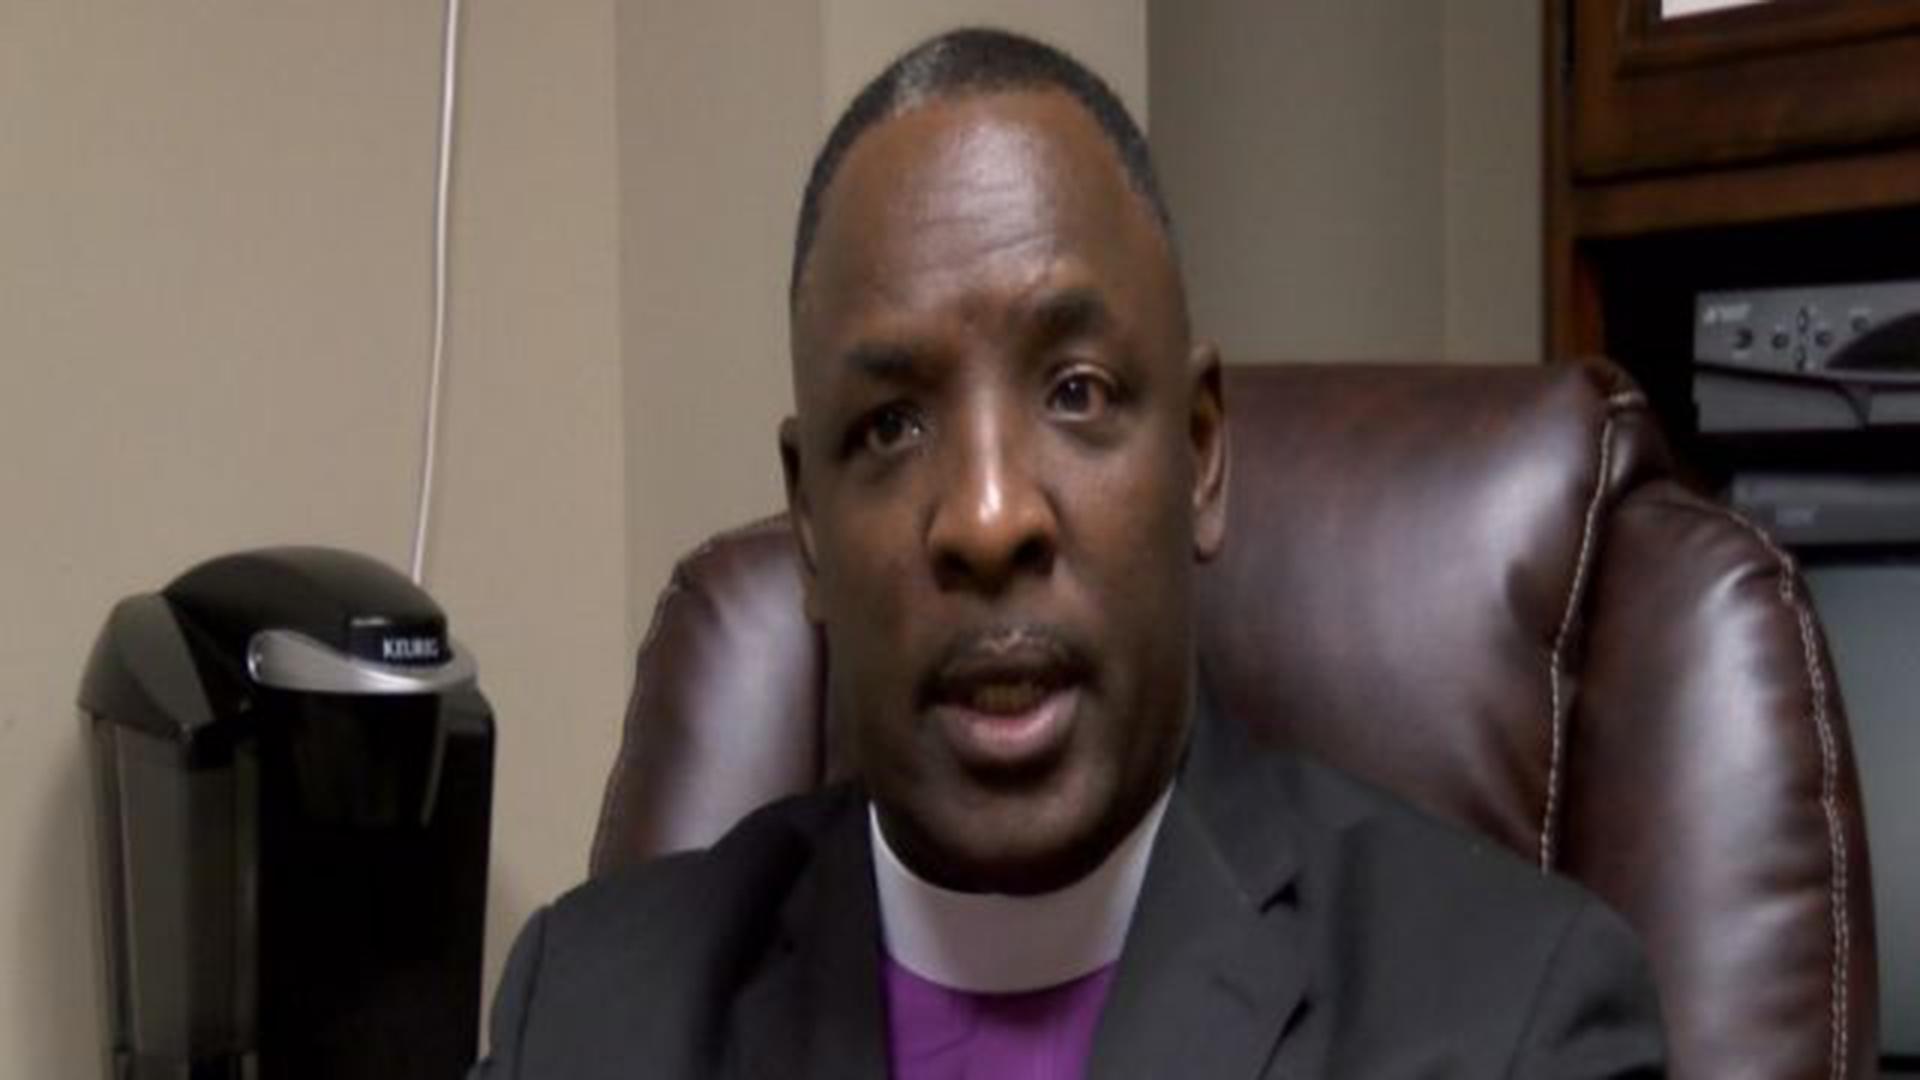 North Carolina Pastor Disarms Vet During New Year's Service